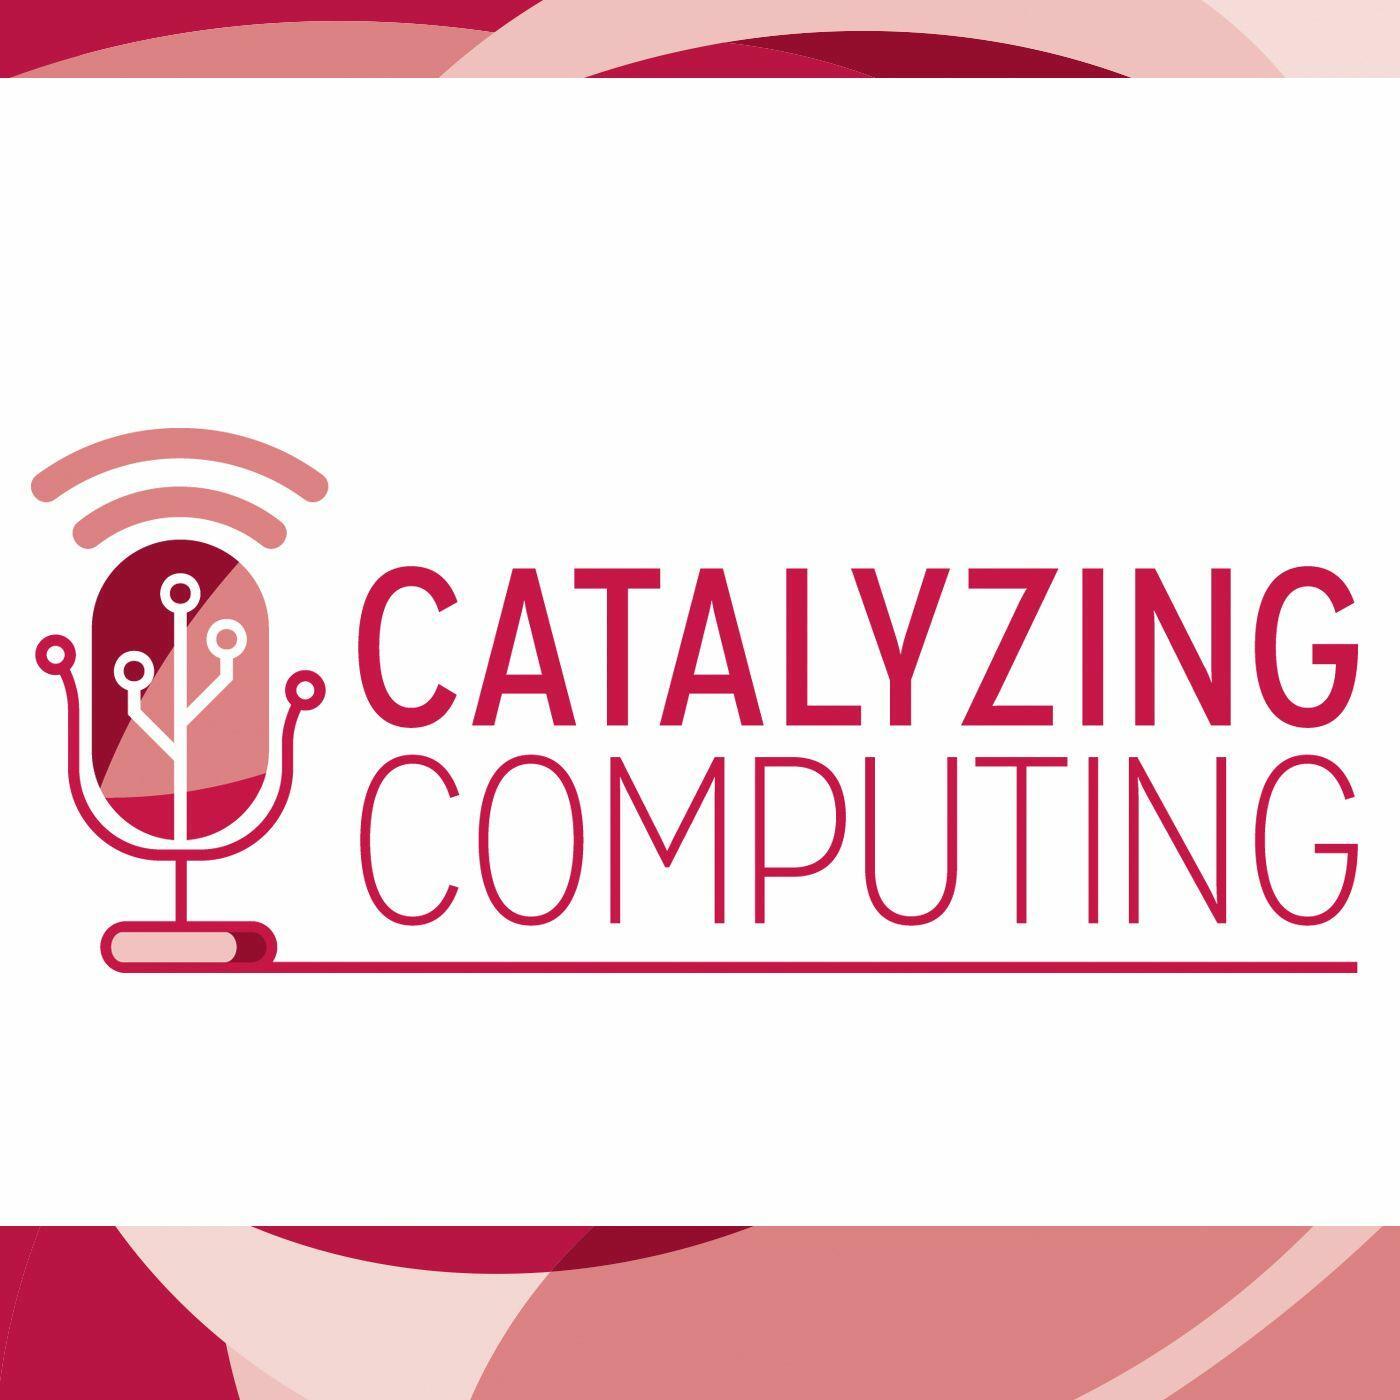 Catalyzing Computing